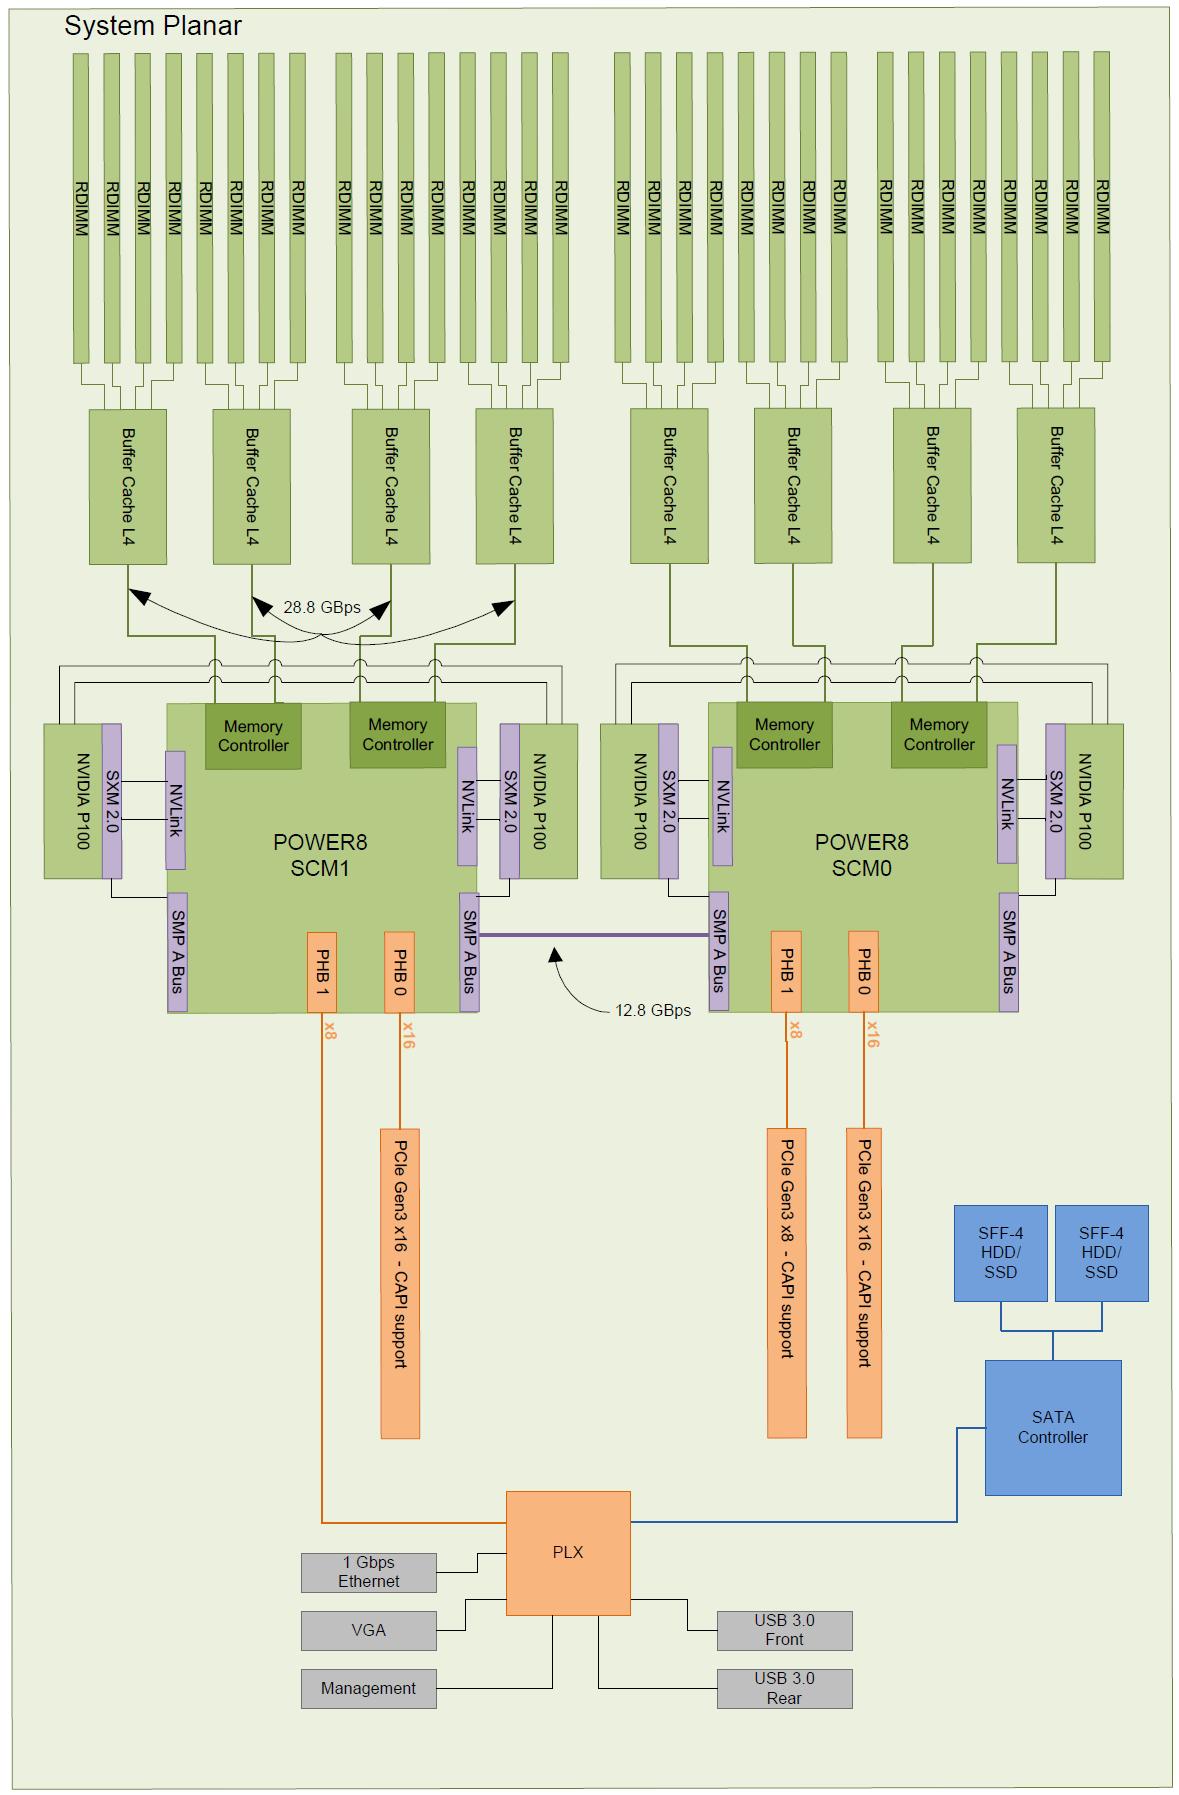 POWER8 SL822LC node logical system diagram